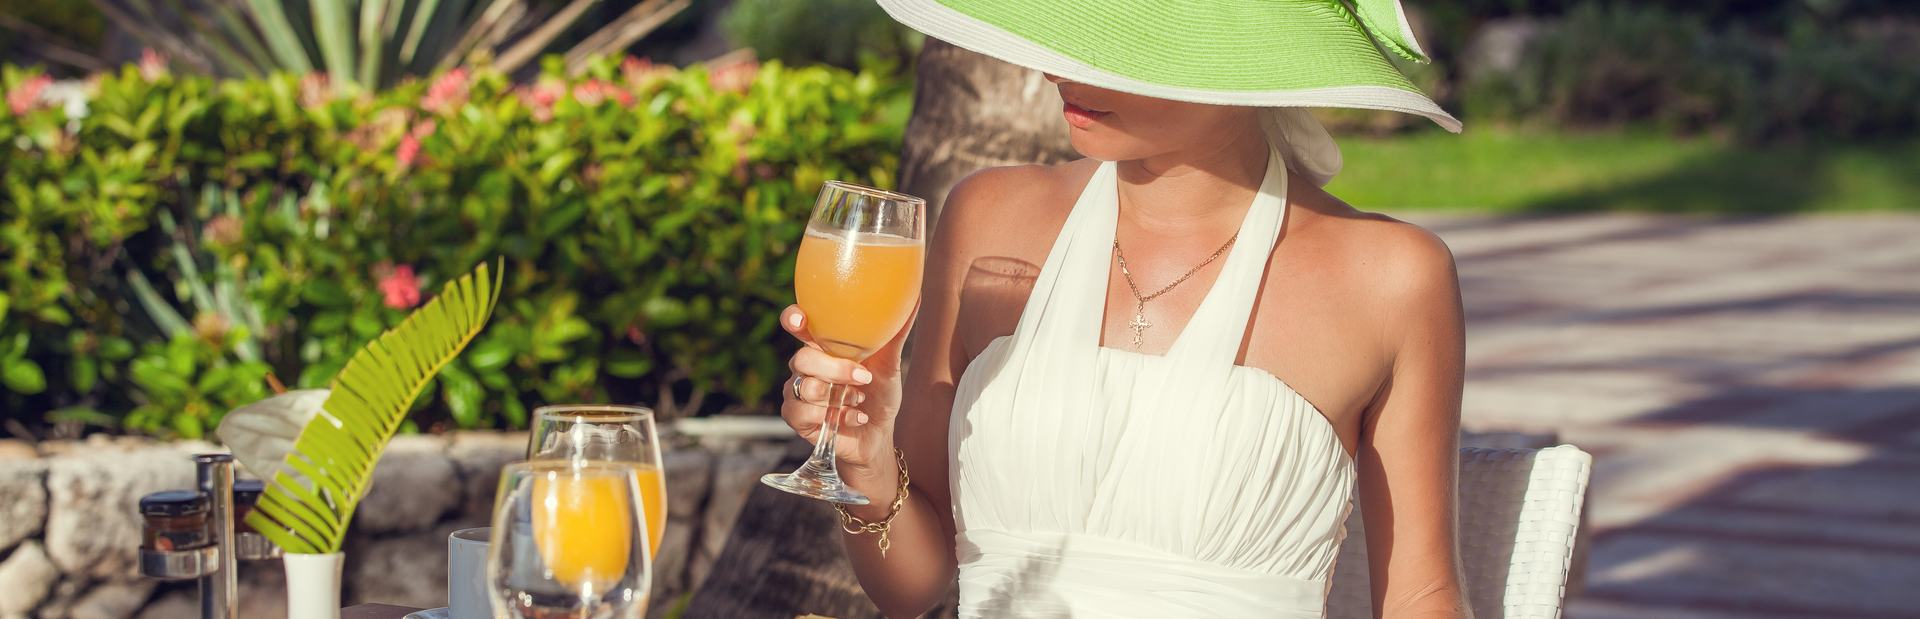 Eat & drink in the Virgin Islands